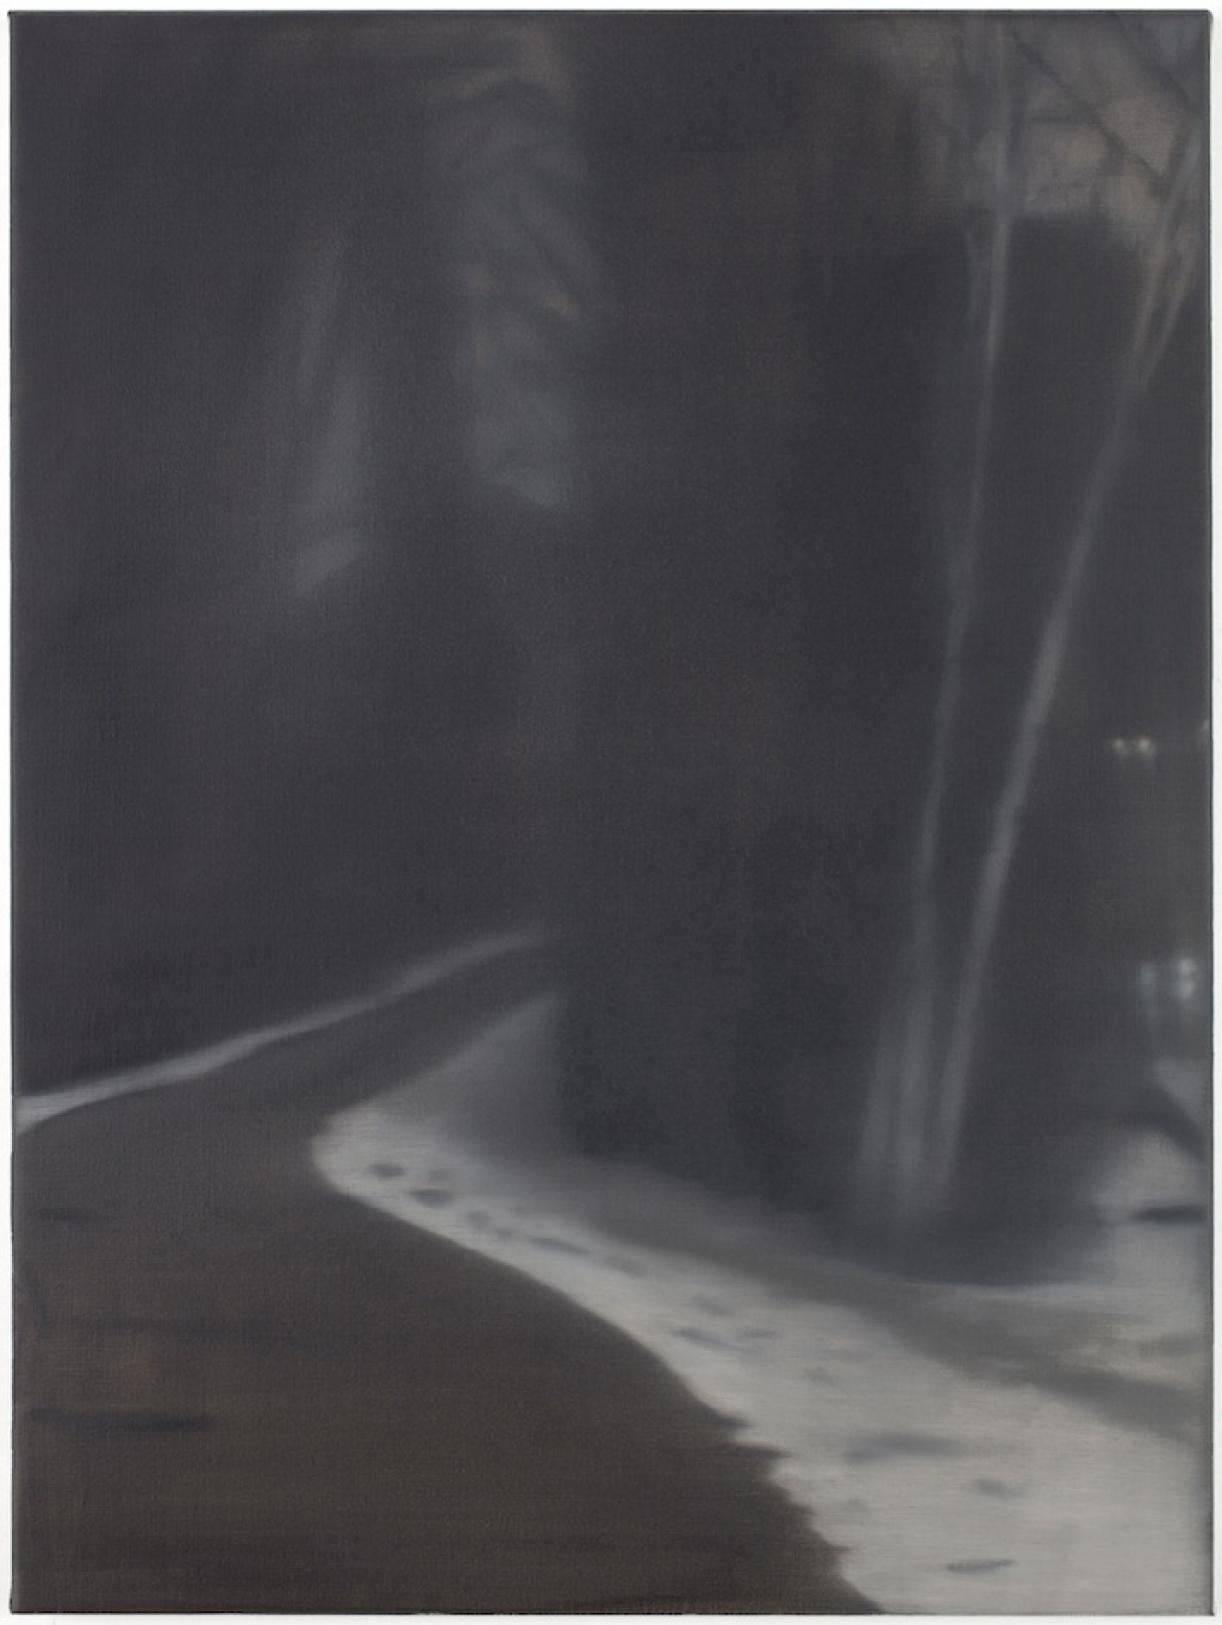 Bert de Beul, Untitled, 2010, Oil on canvas, 100 x 75 cm